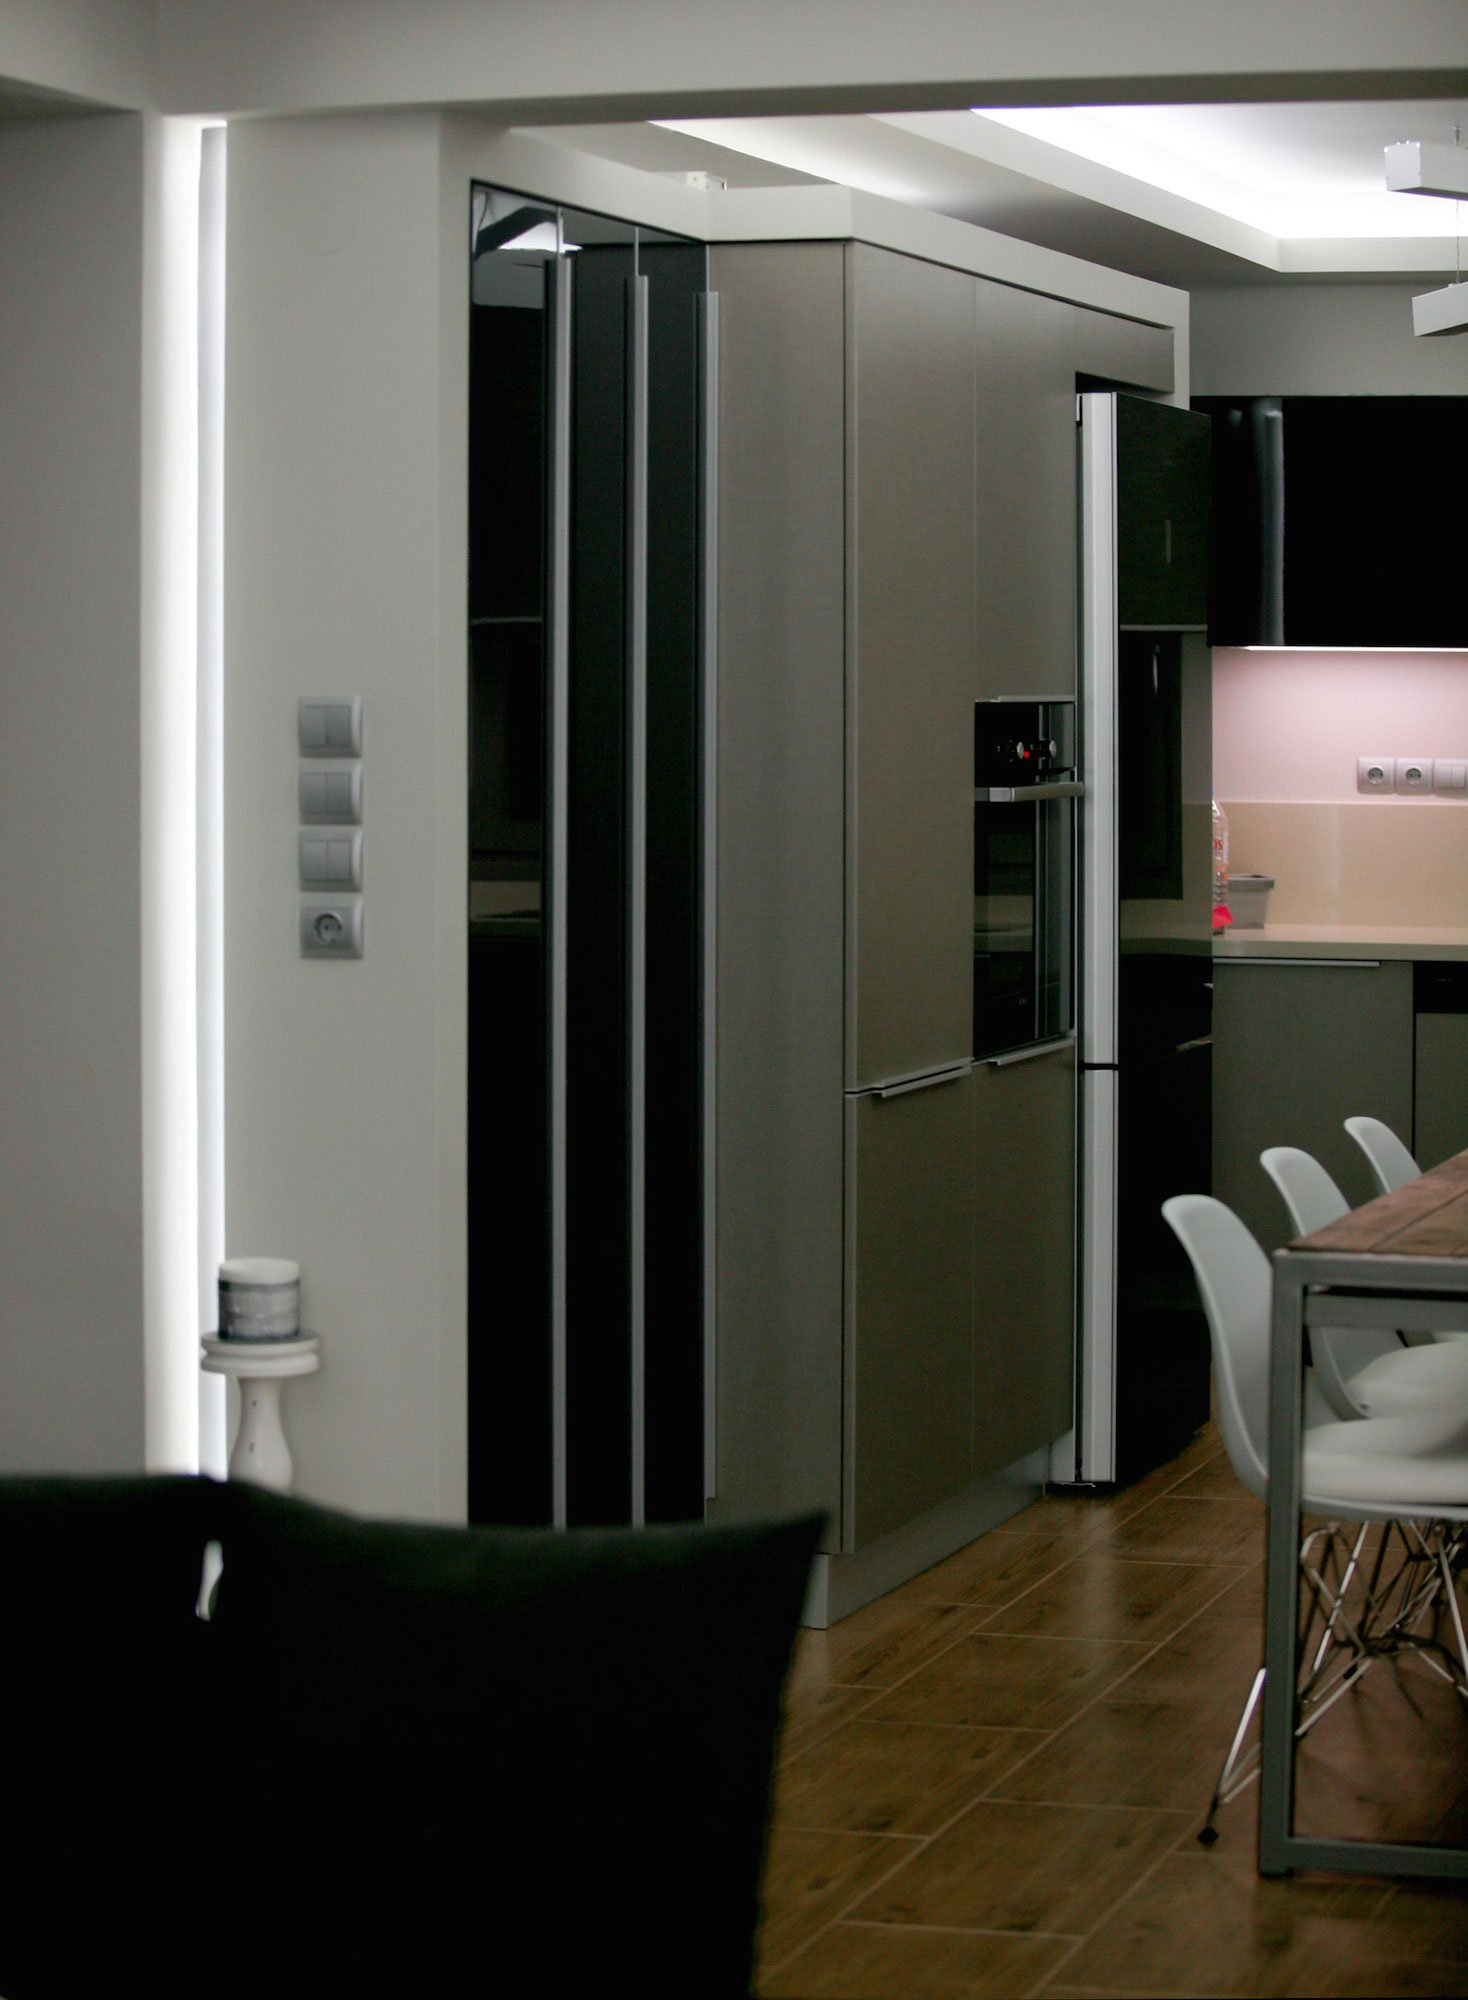 A-Stylish-Apartment-in-Heraklion-10